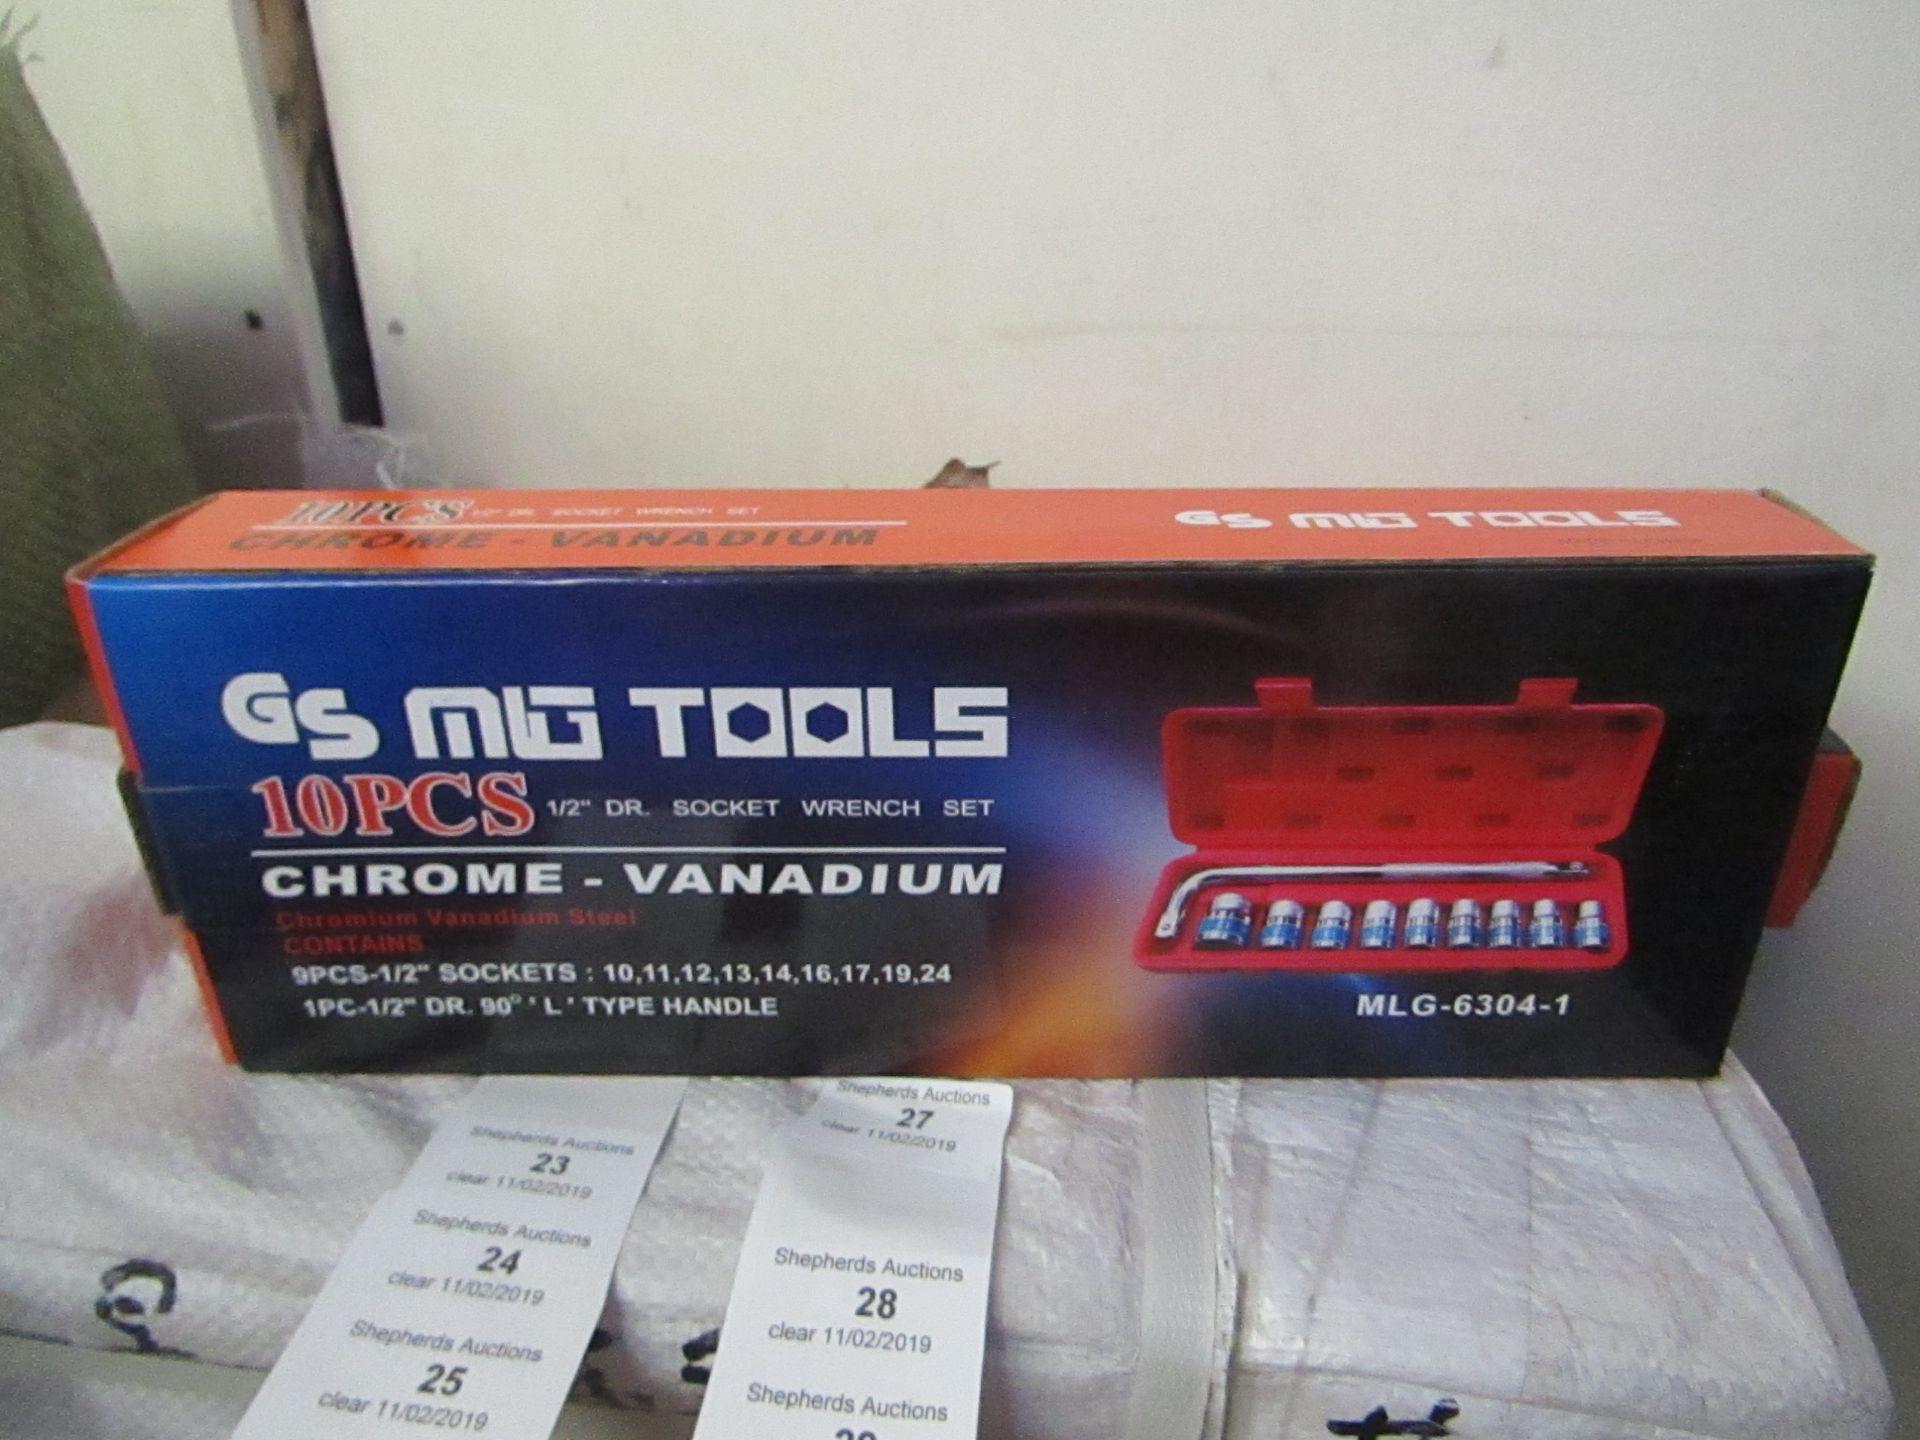 Lot 31 - 10 piece Chrome Vanadium Socket wrench set, new